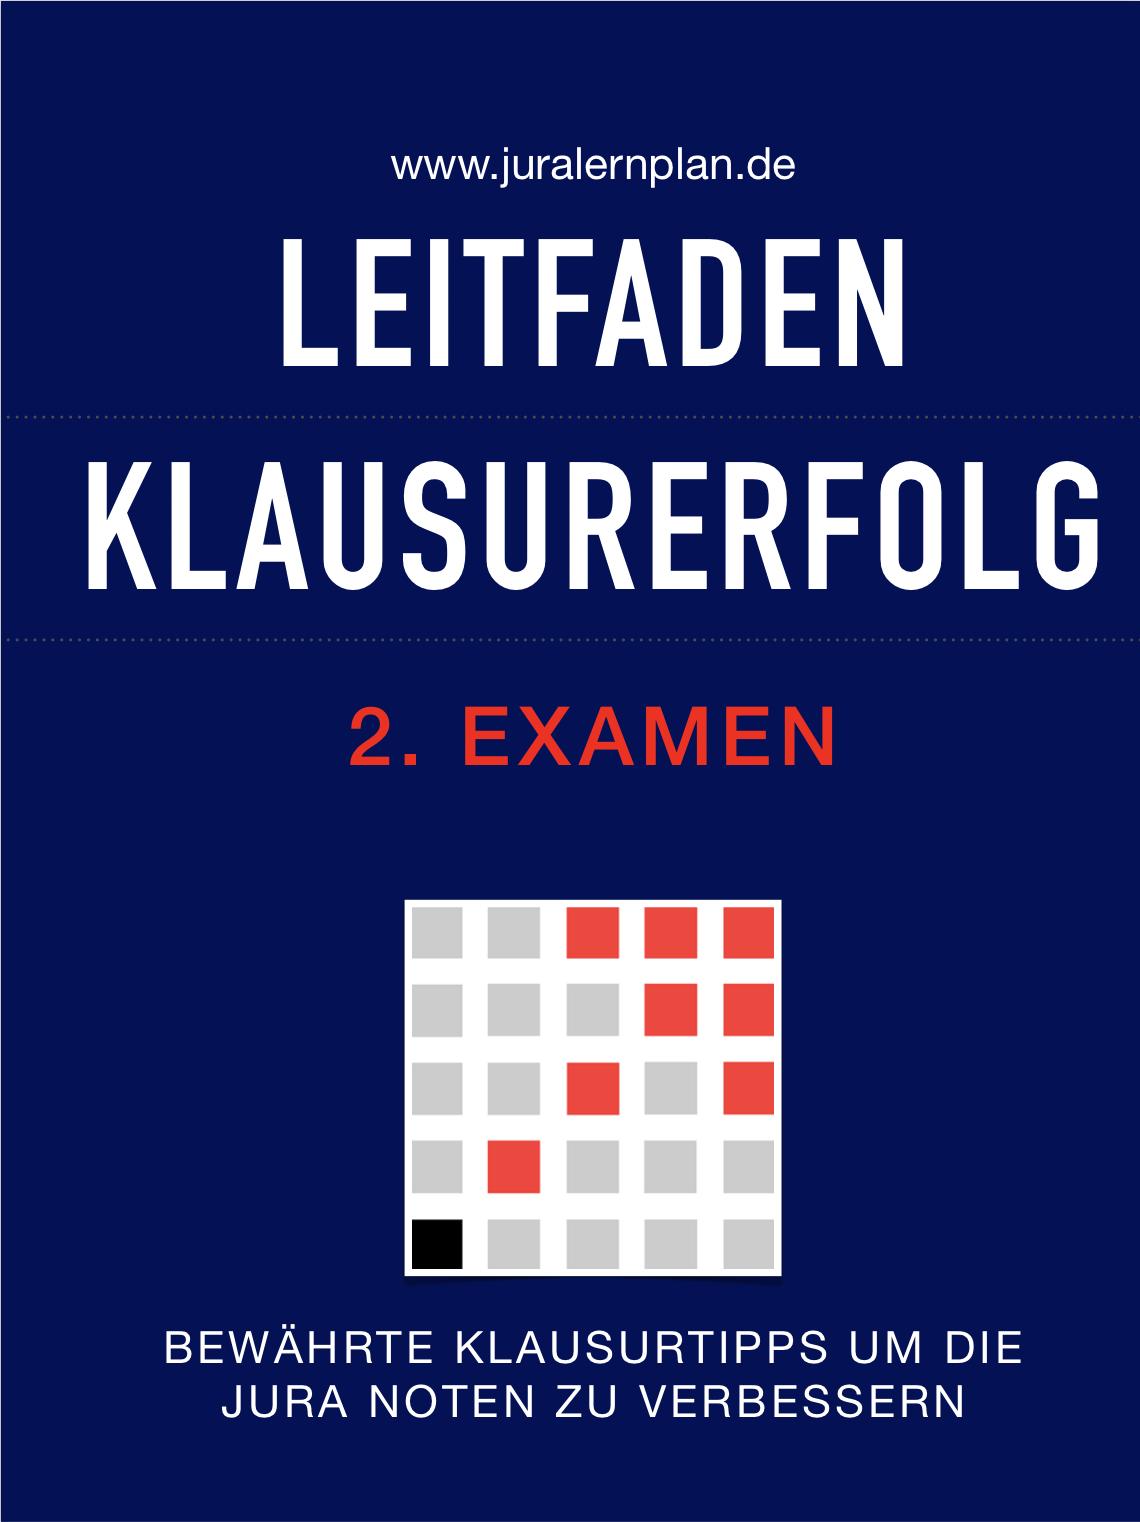 Leitfaden Klausurerfolg 2. Examen - JURALERNPLAN Jura Lernplan Studium Examen